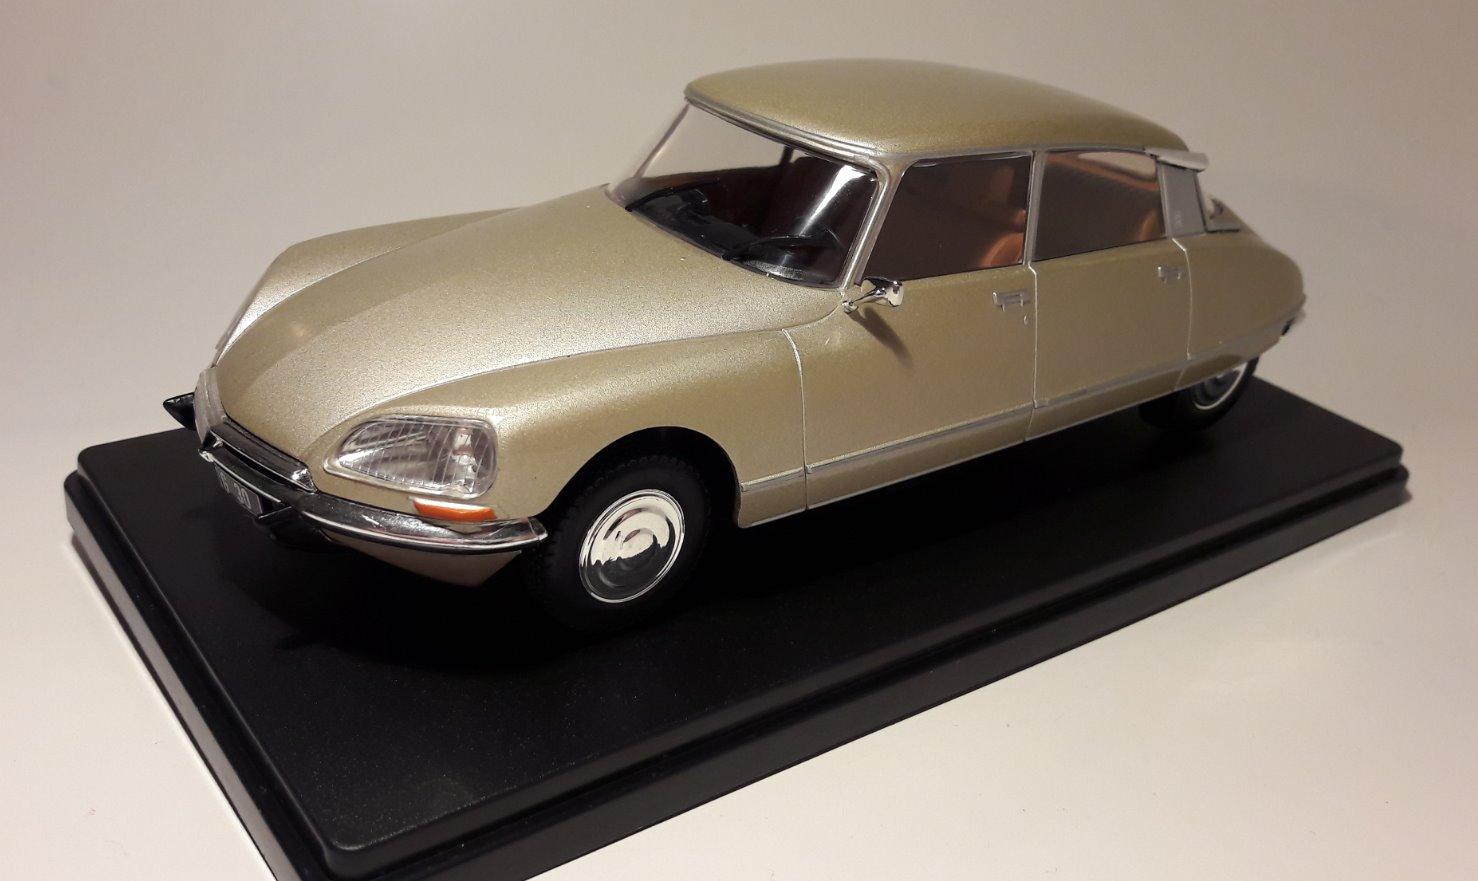 diecast book cars 1 24 auto vintage collection france. Black Bedroom Furniture Sets. Home Design Ideas